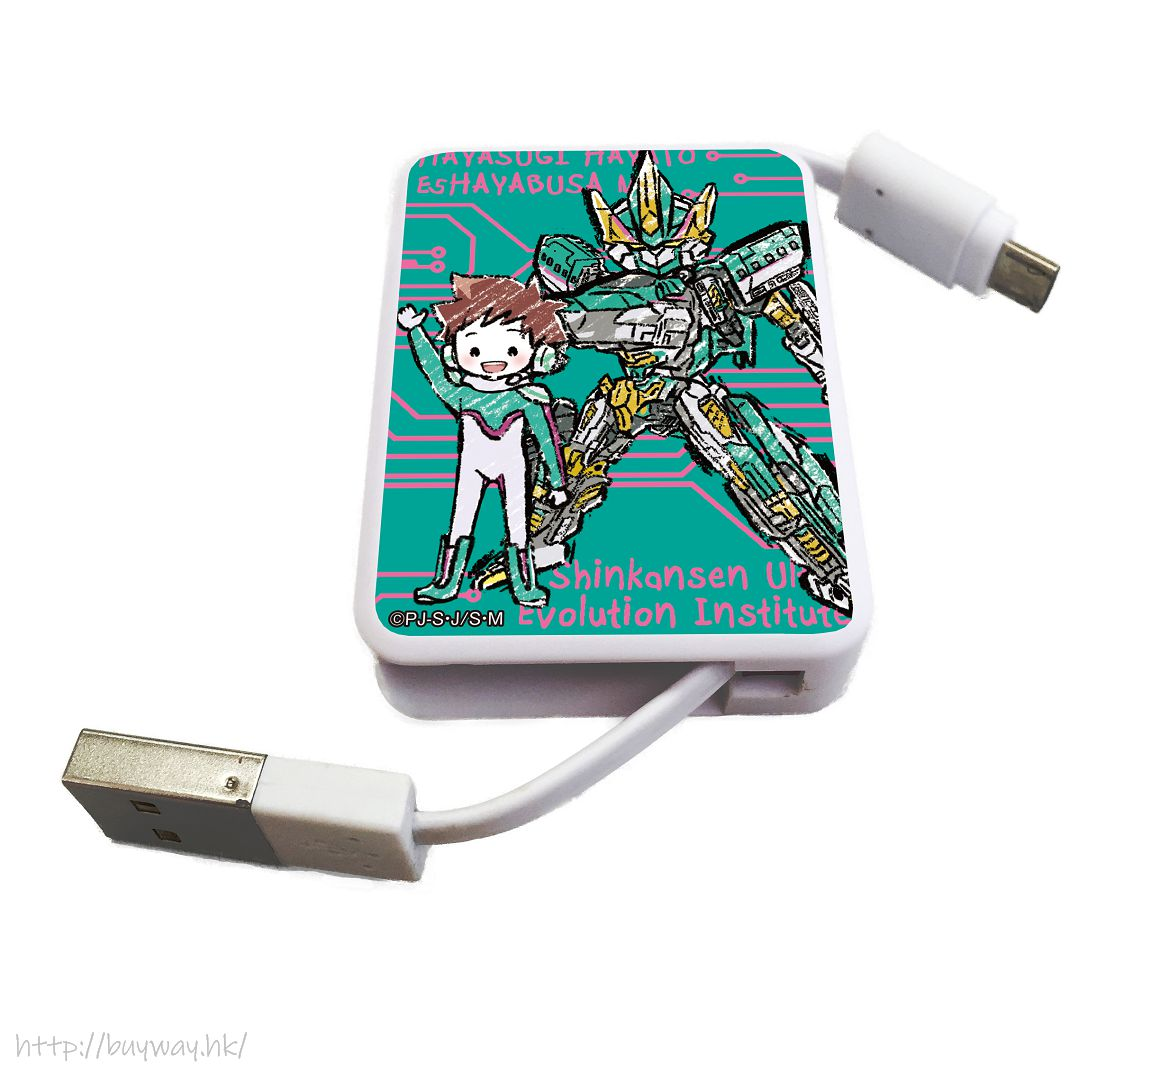 新幹線變形機器人Shinkalion 「速杉隼人」USB 2.0 數據線 (Graff Art Design)  Chara Reel 01 Hayasugi Hayato (Graff Art Design)【Shinkansen Henkei Robo Shinkalion】